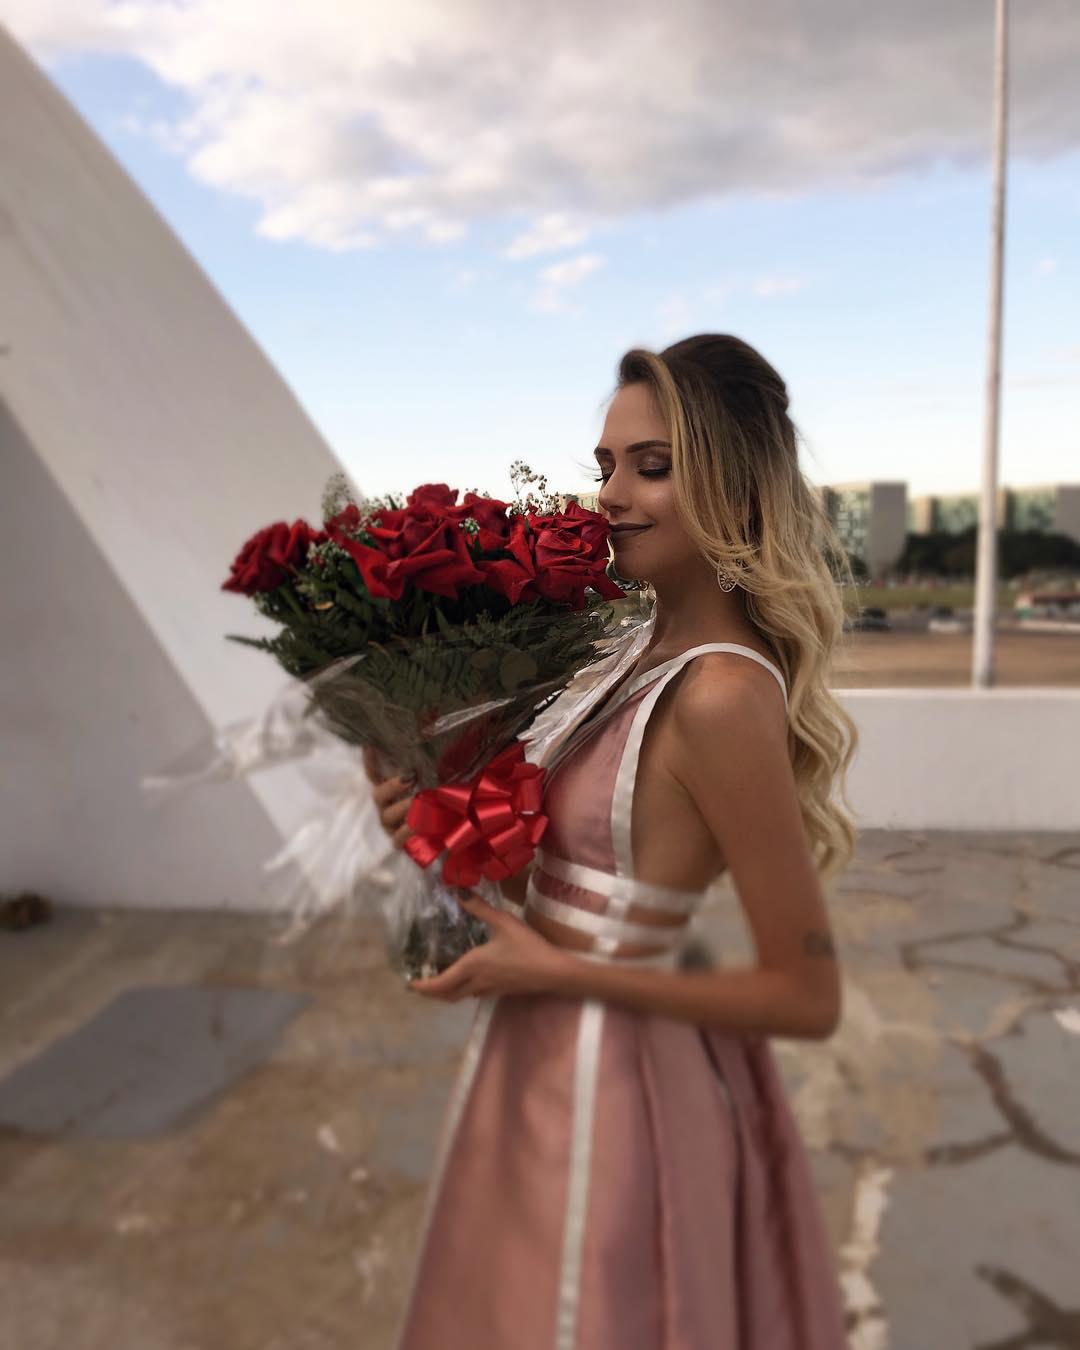 isabela schott, miss brasilia mundo 2018. 33248110